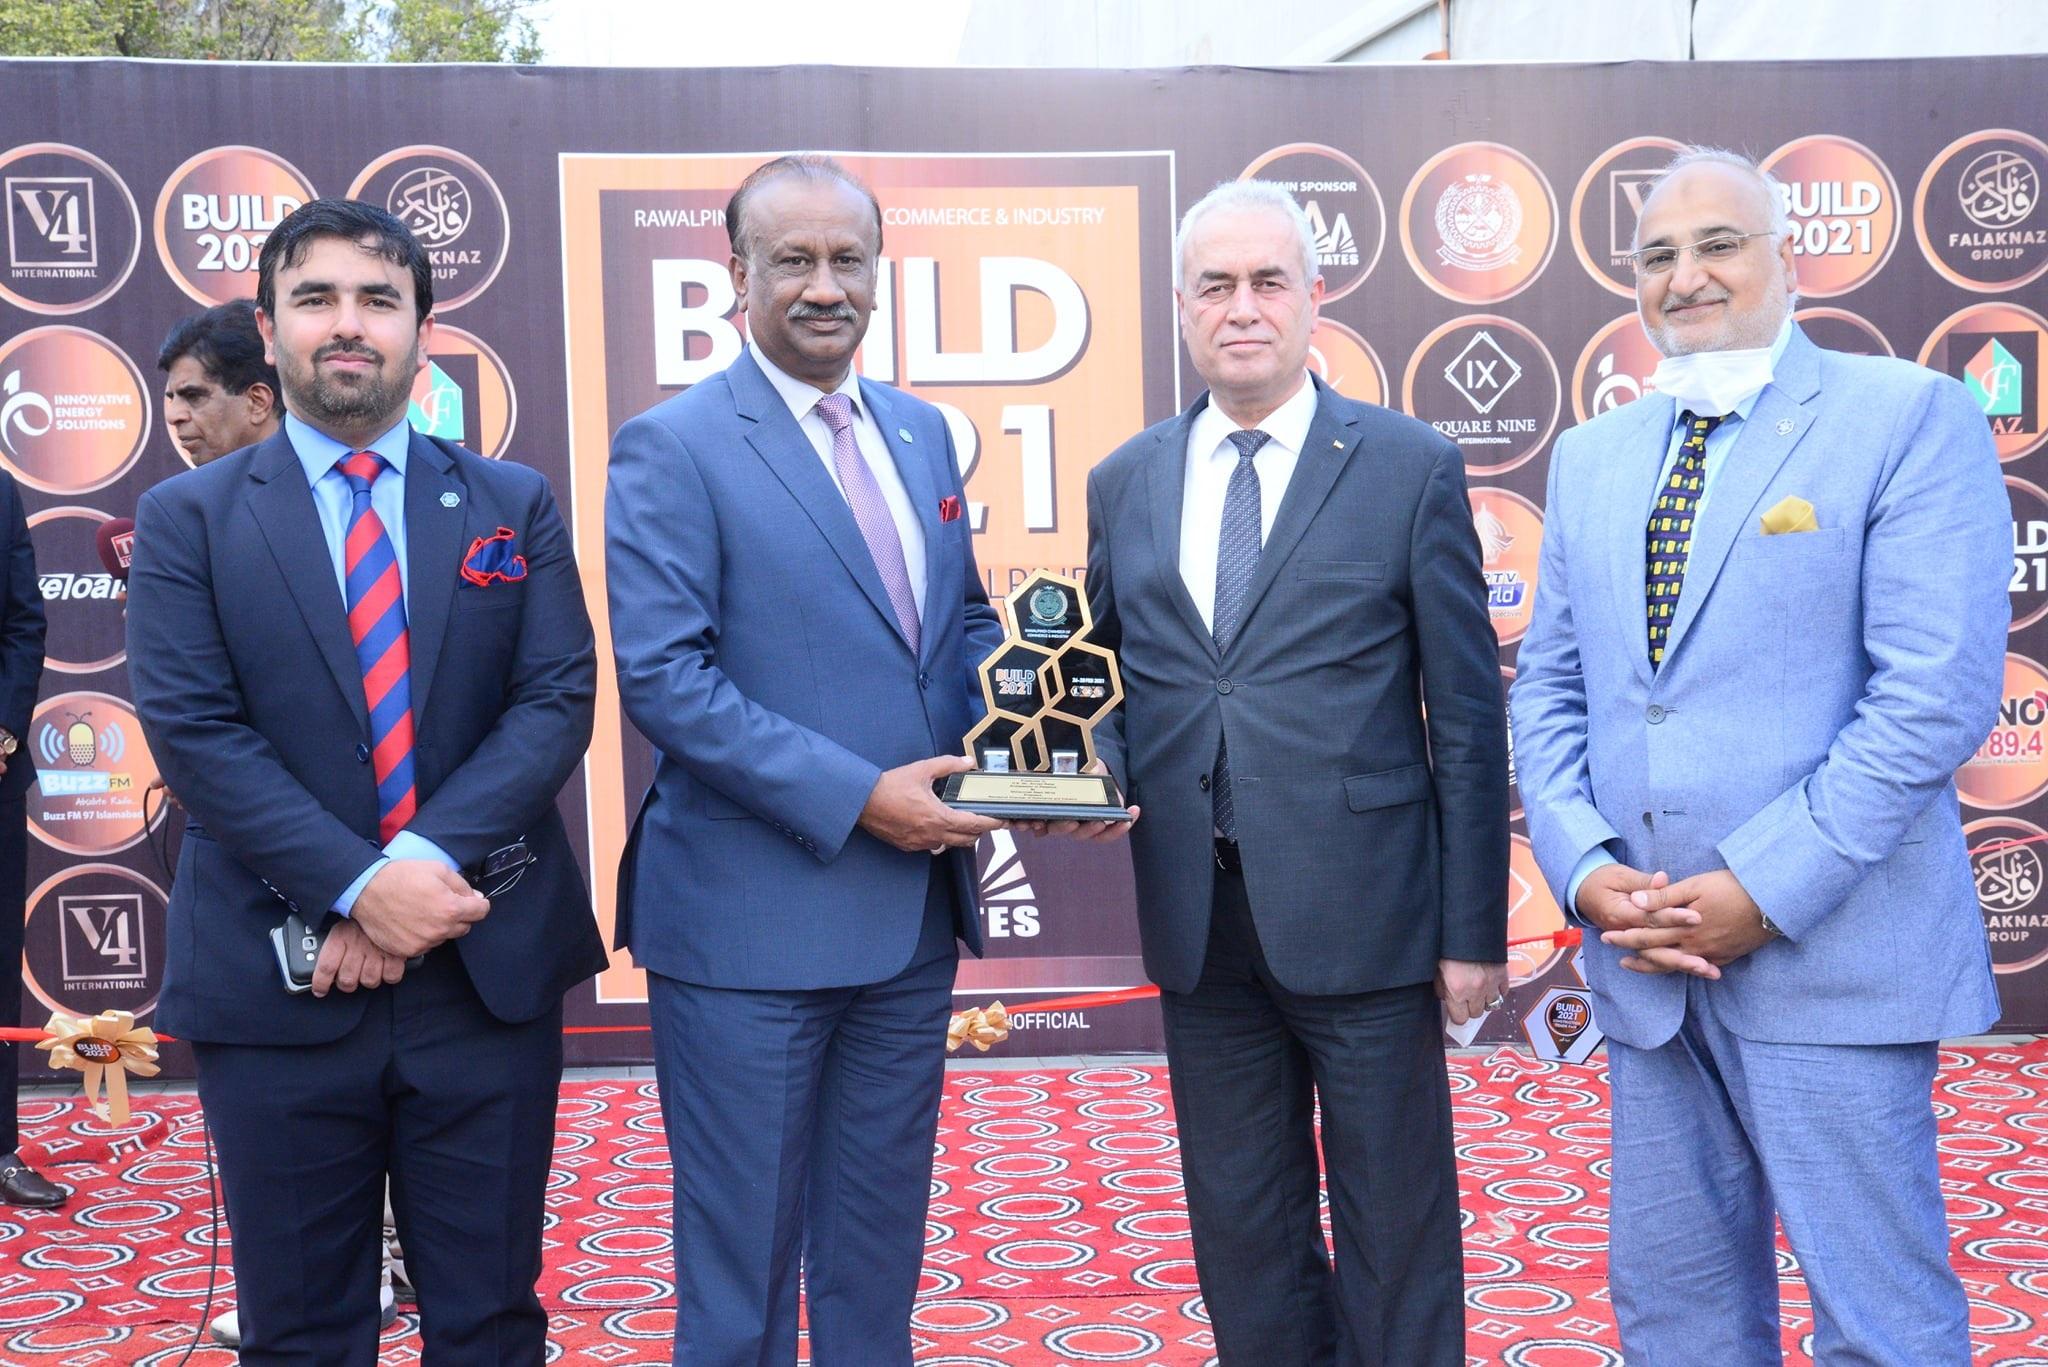 RCCI President Nasir Mirza Presenting memnto to Palestine Ambassador Ahmed Jawad Rabie at RCCI Build 2021 Expo Ayub Park